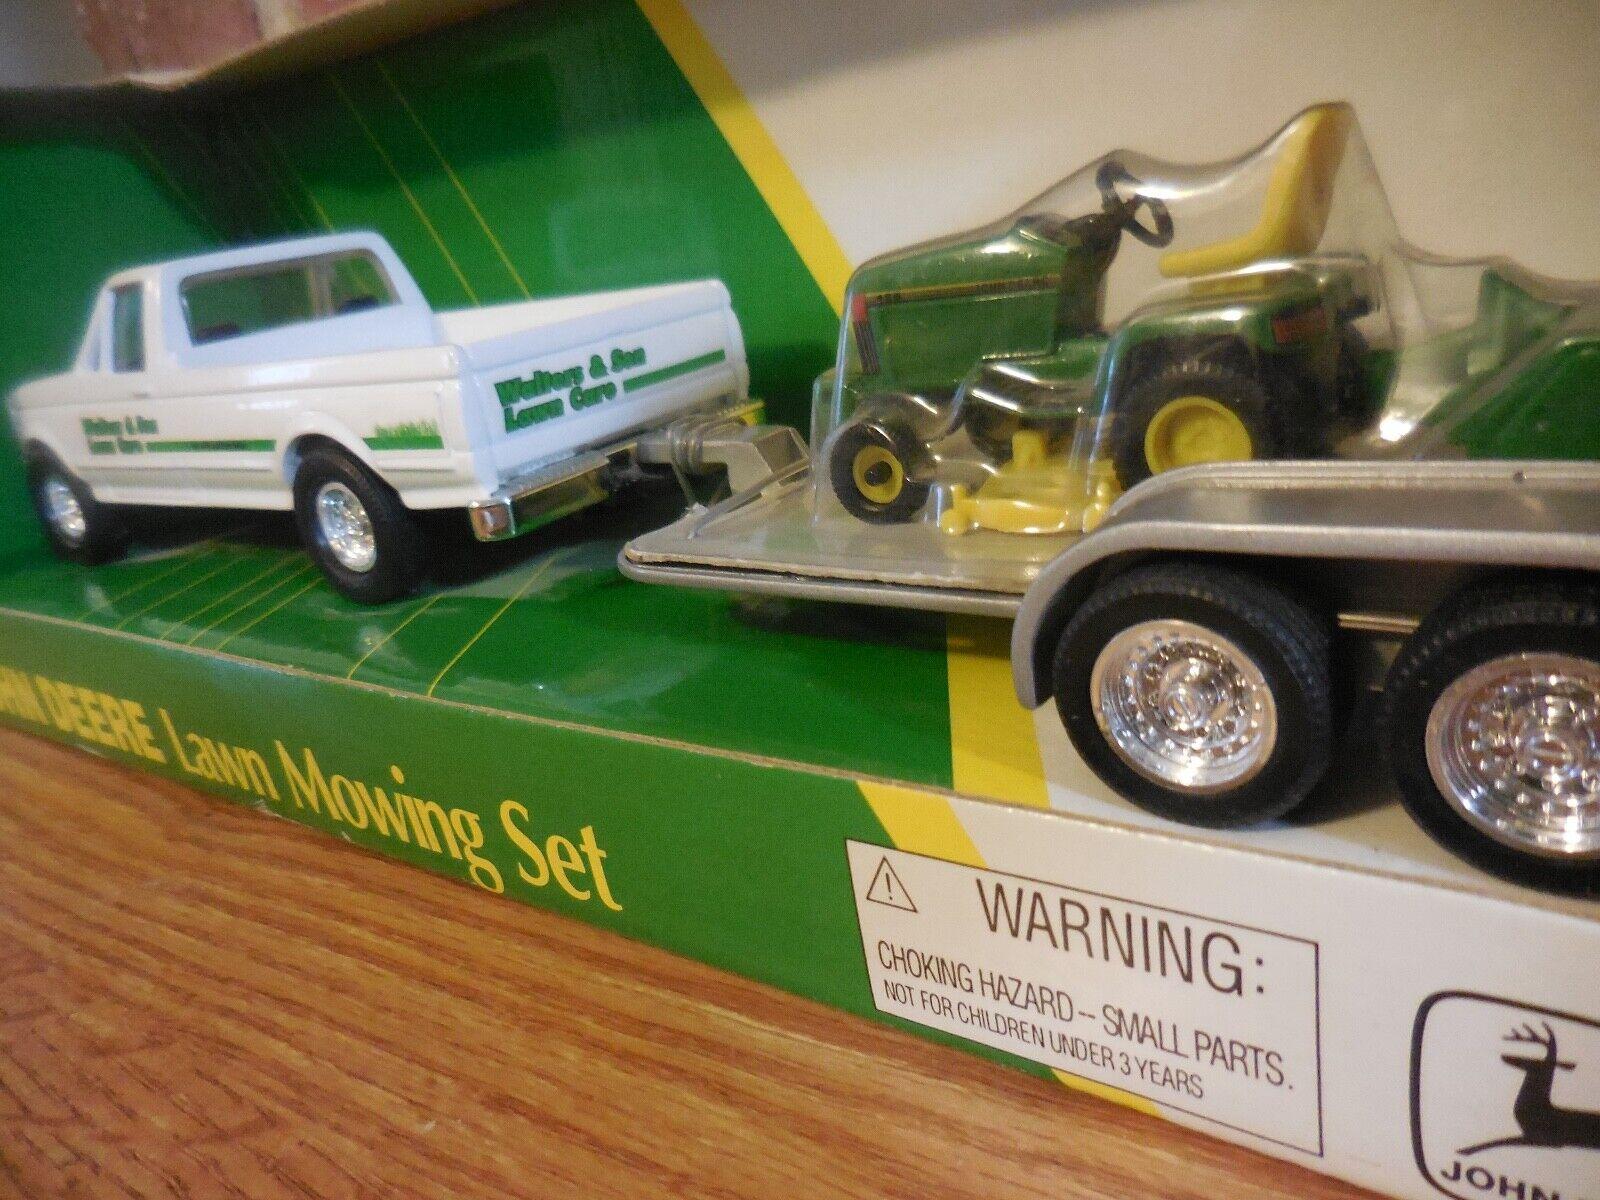 Ertl 1 32 John Deere 455 Segadora & Camioneta Ford Con Remolque De Juguete Conjunto de Superficie Plana